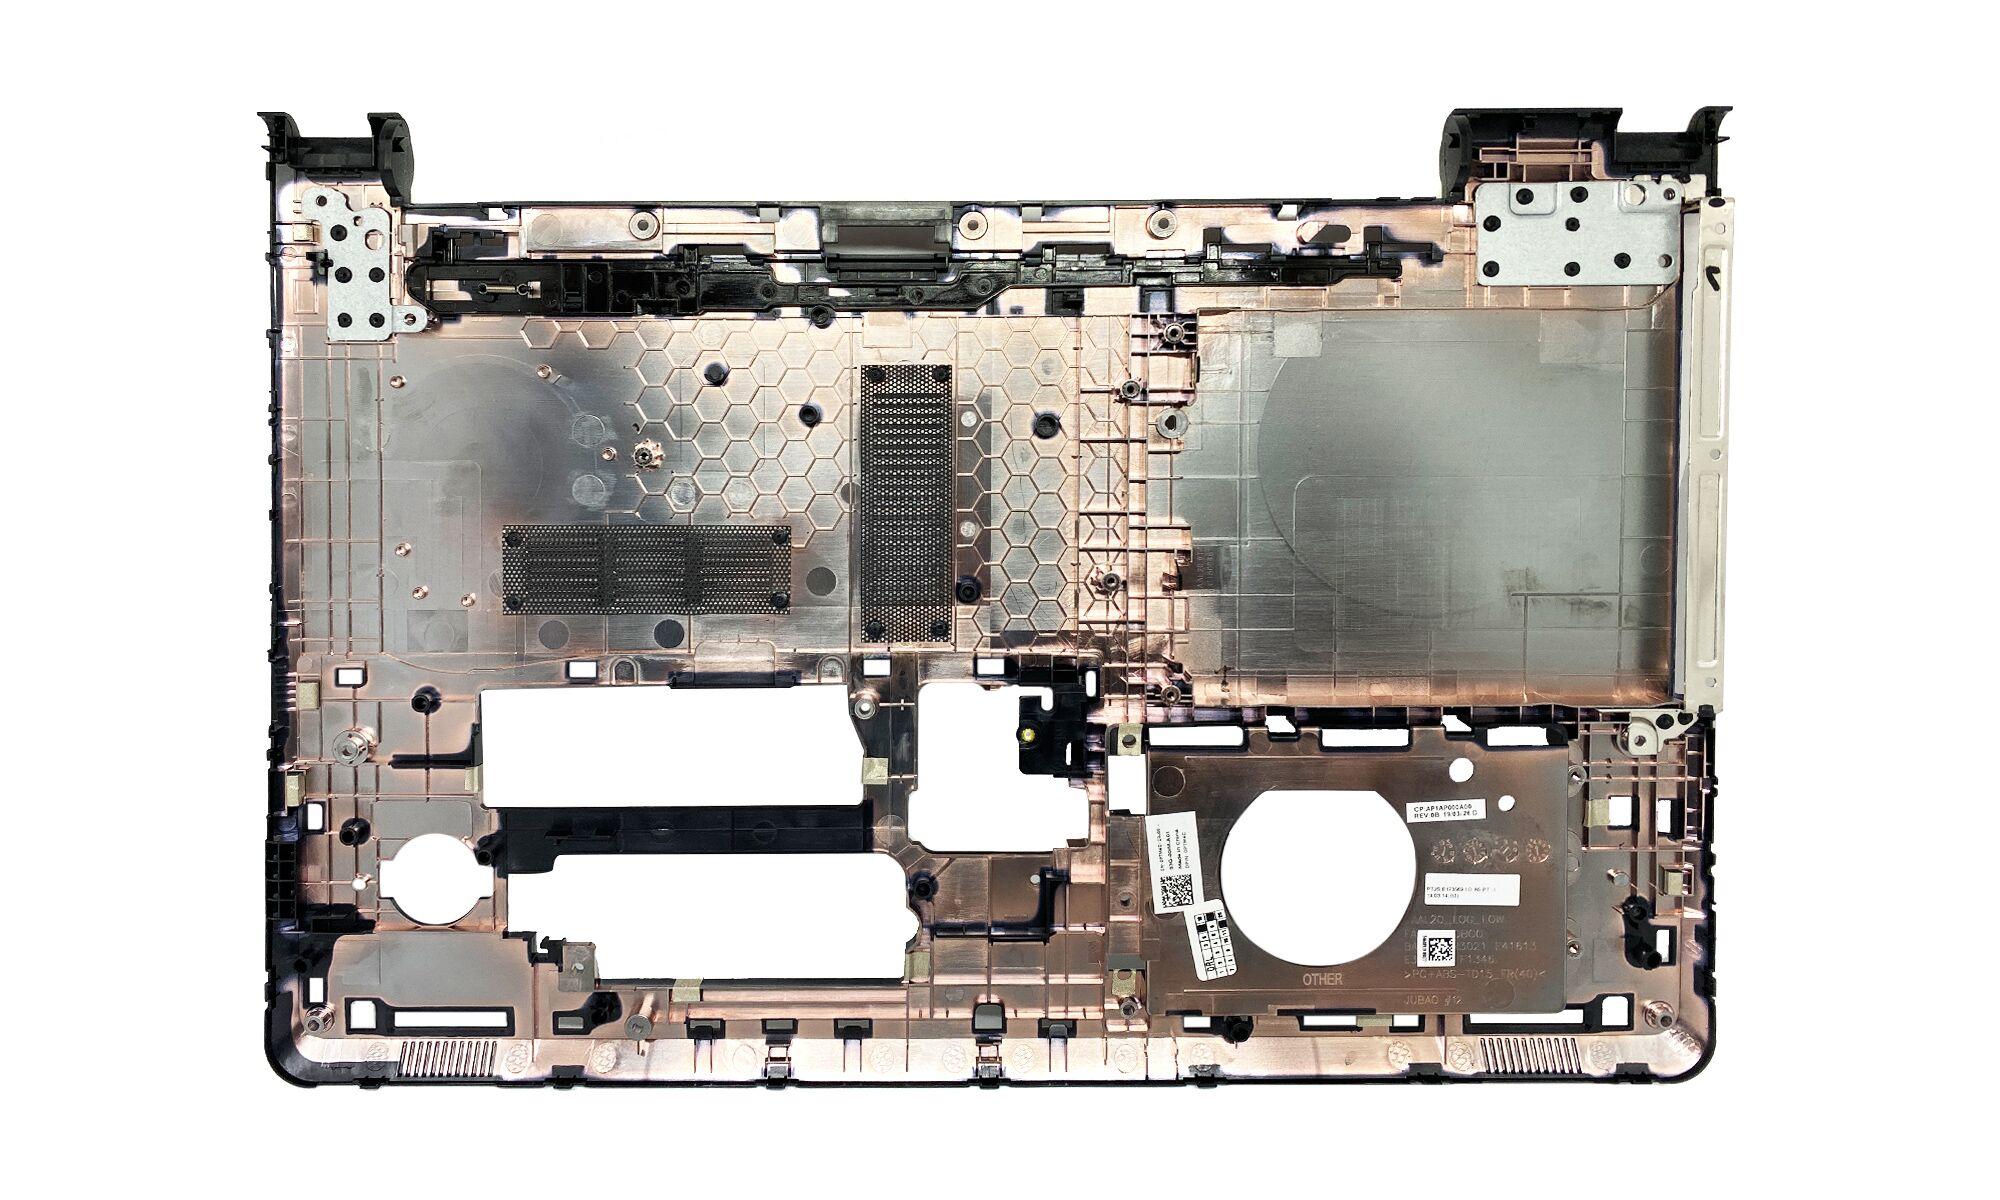 Carcasa inferioara originala Dell Inspiron 5552, 15 5551, 15 5558, 15 5559, Vostro 15 3558, model PTM4C